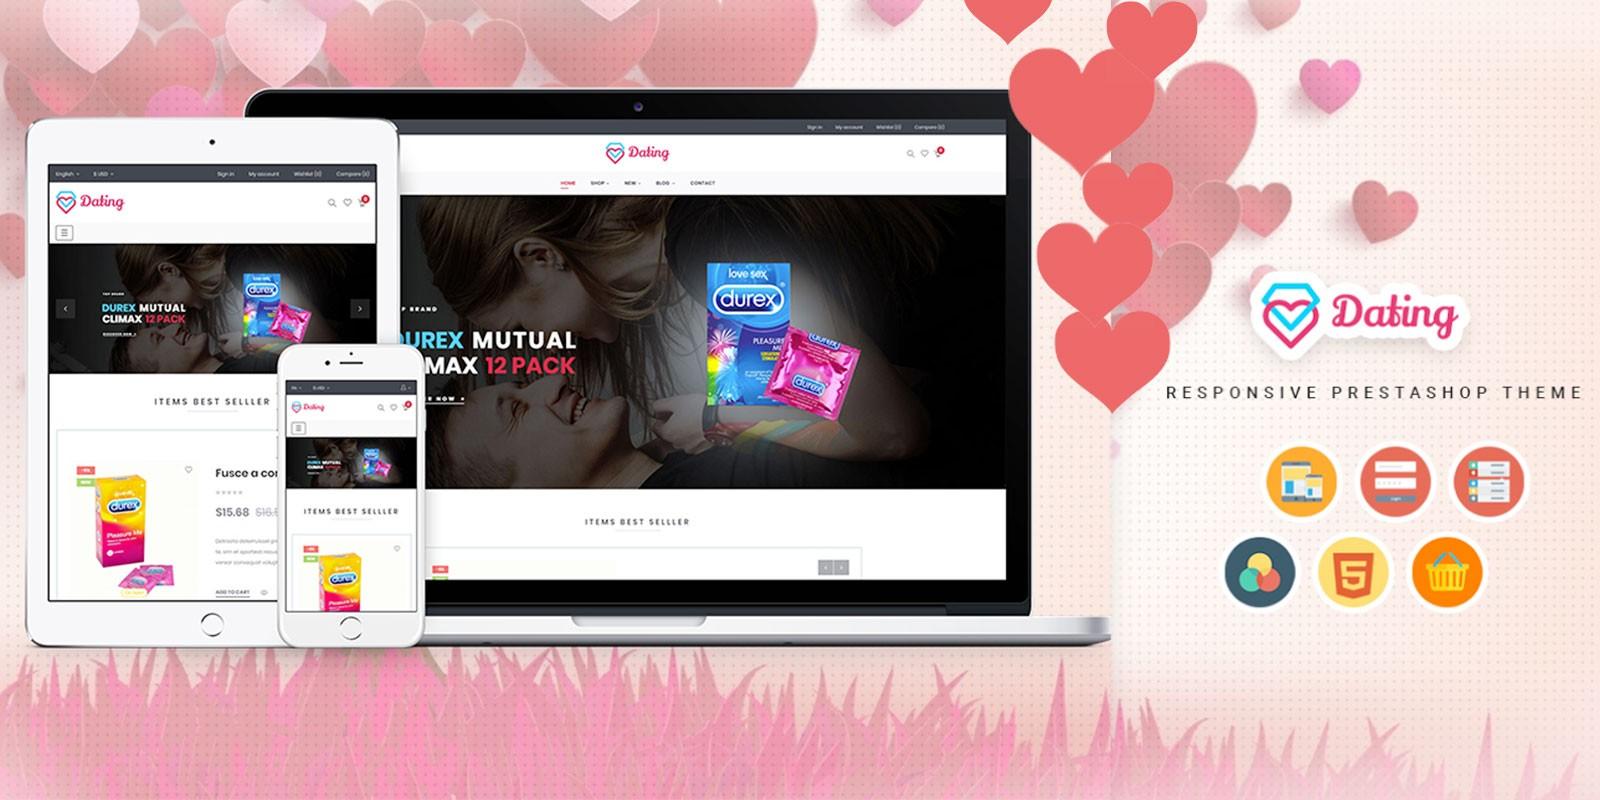 Ap Dating - Prestashop Theme